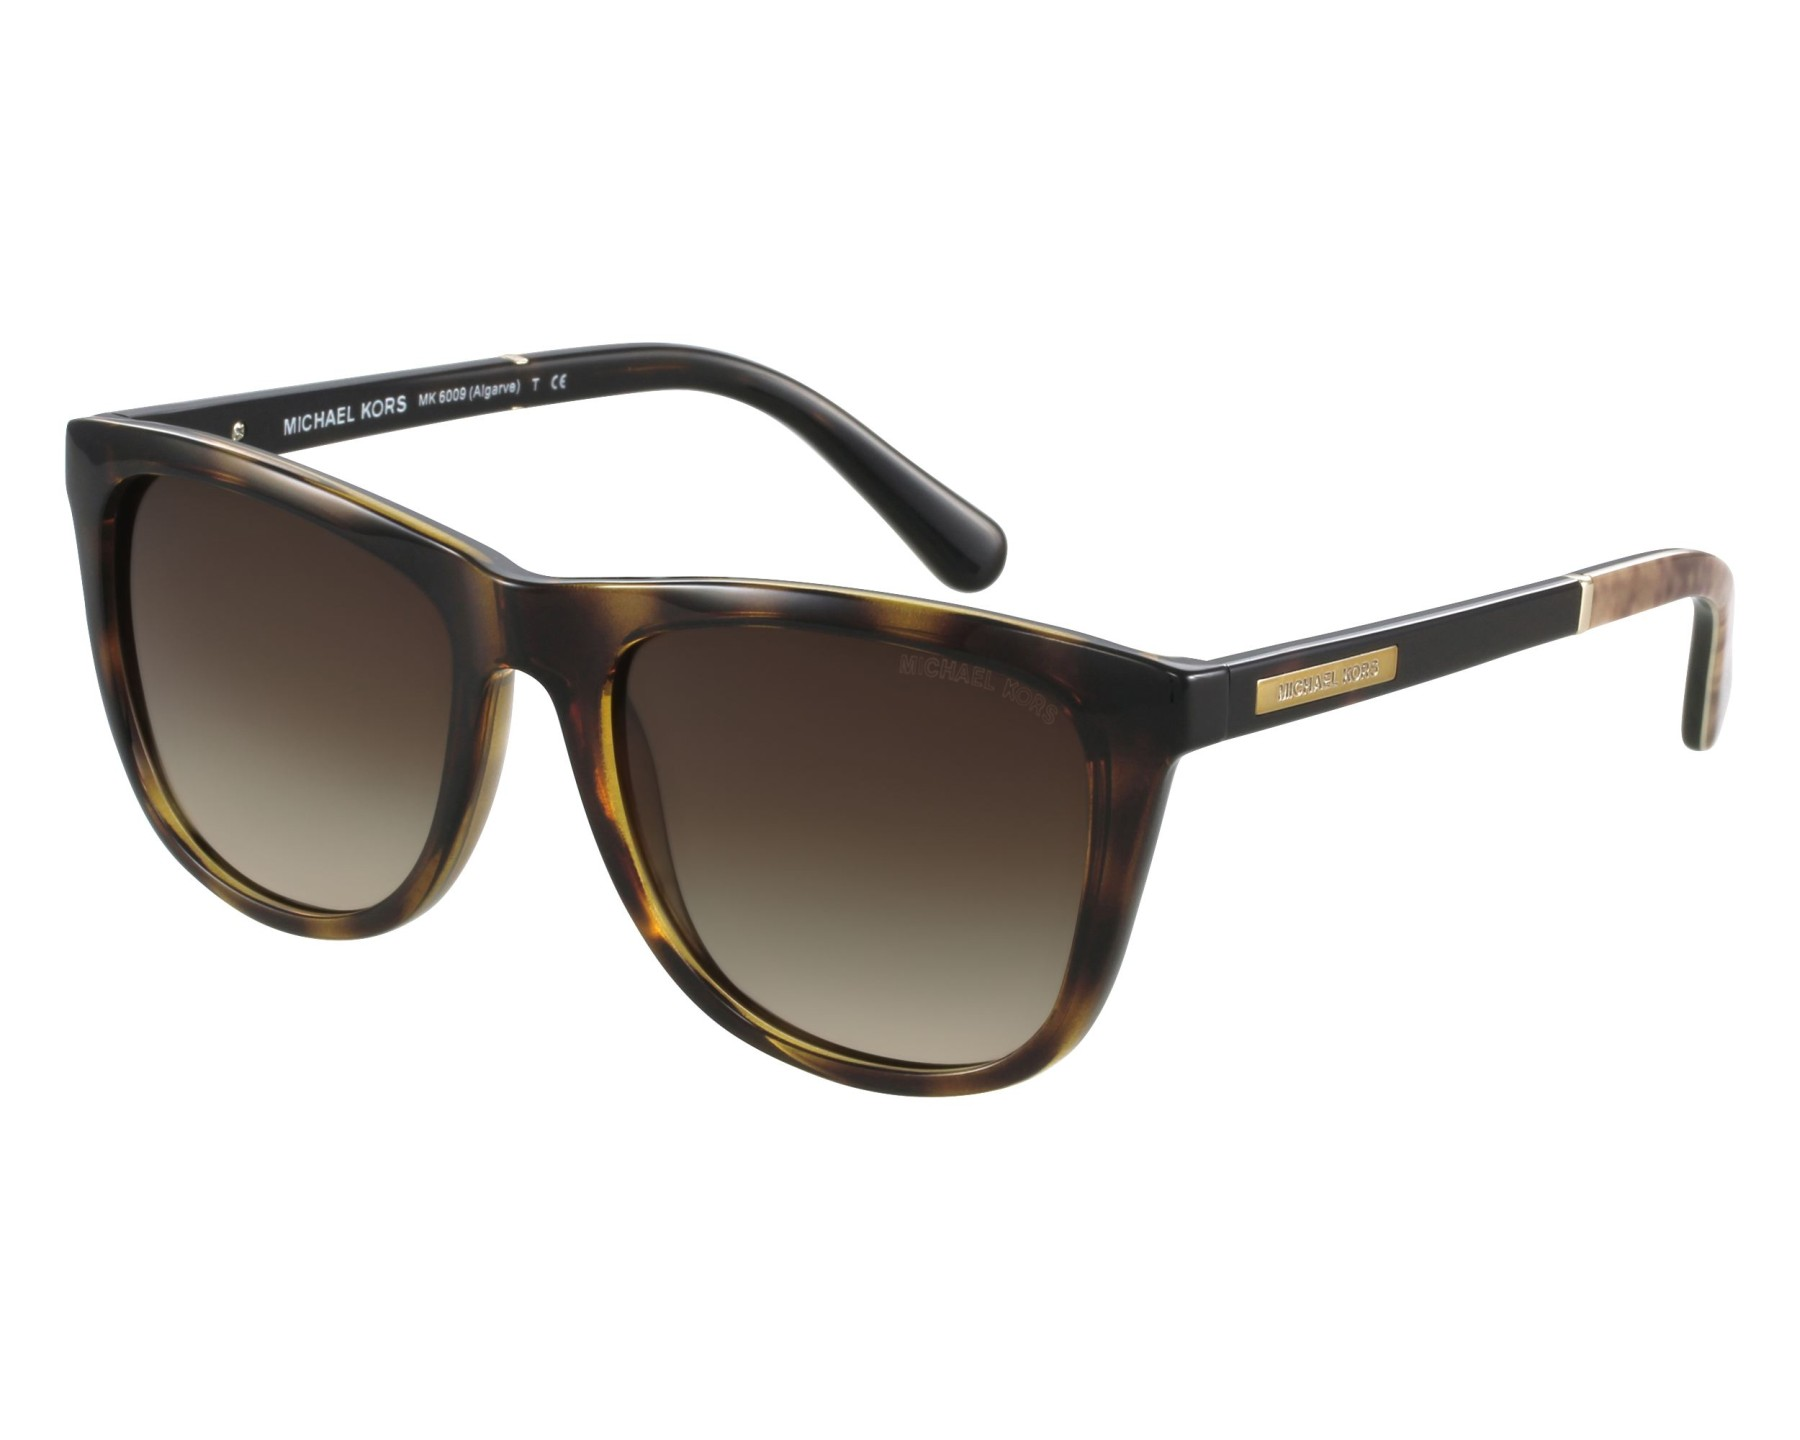 f90abd081edaf Sunglasses Michael Kors MK-6009 301013 - Havana front view